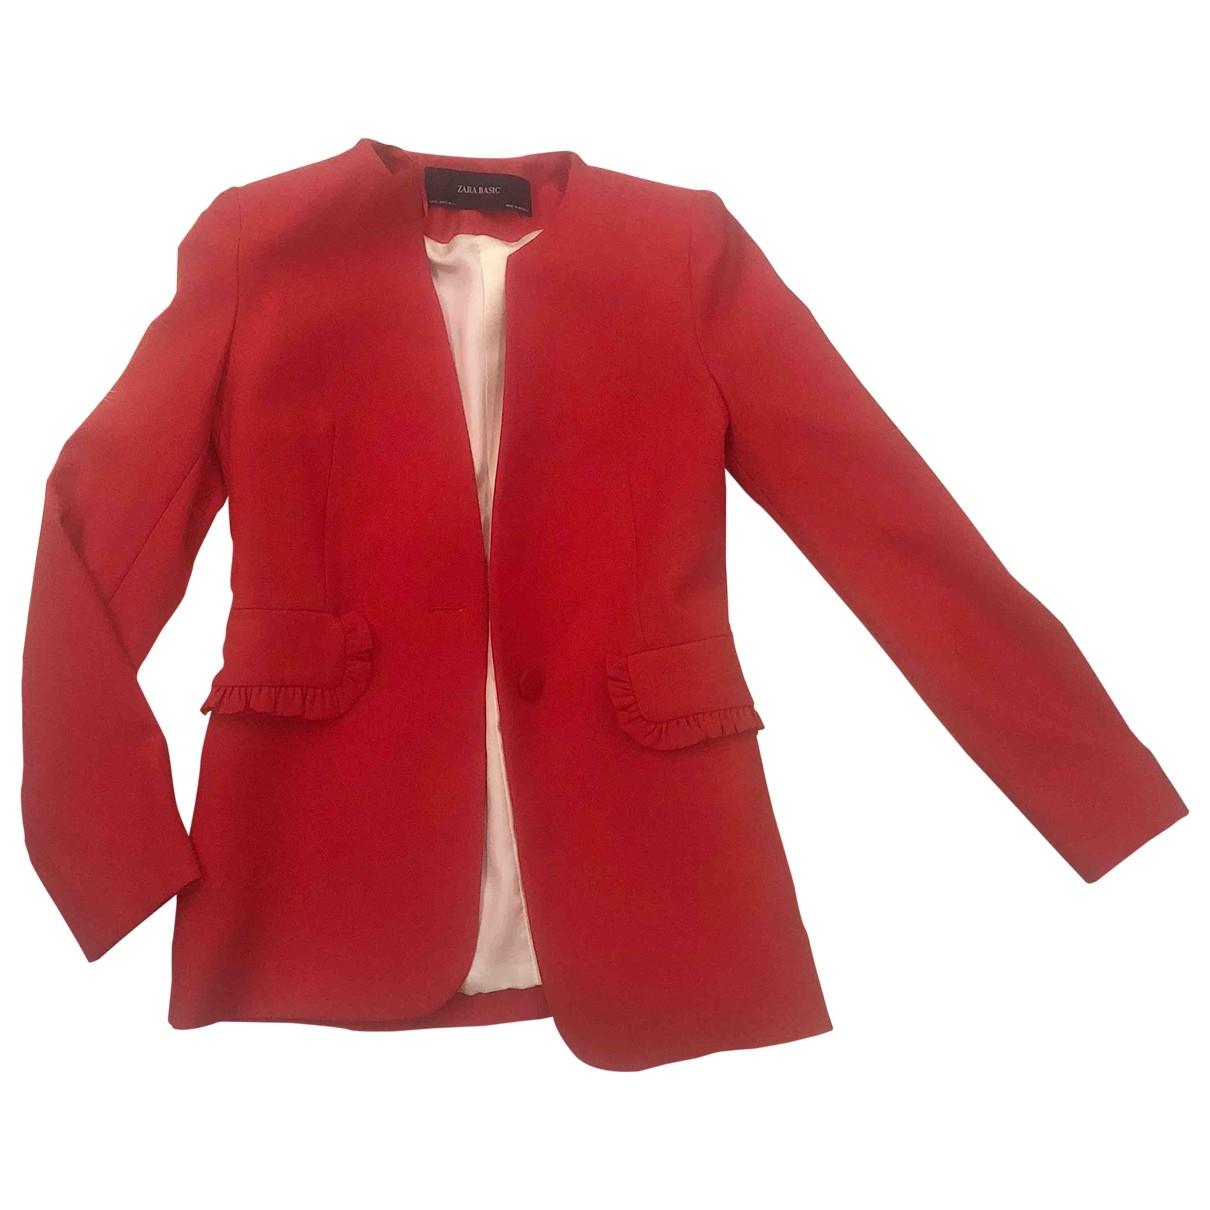 Zara \N Red jacket for Women XS International